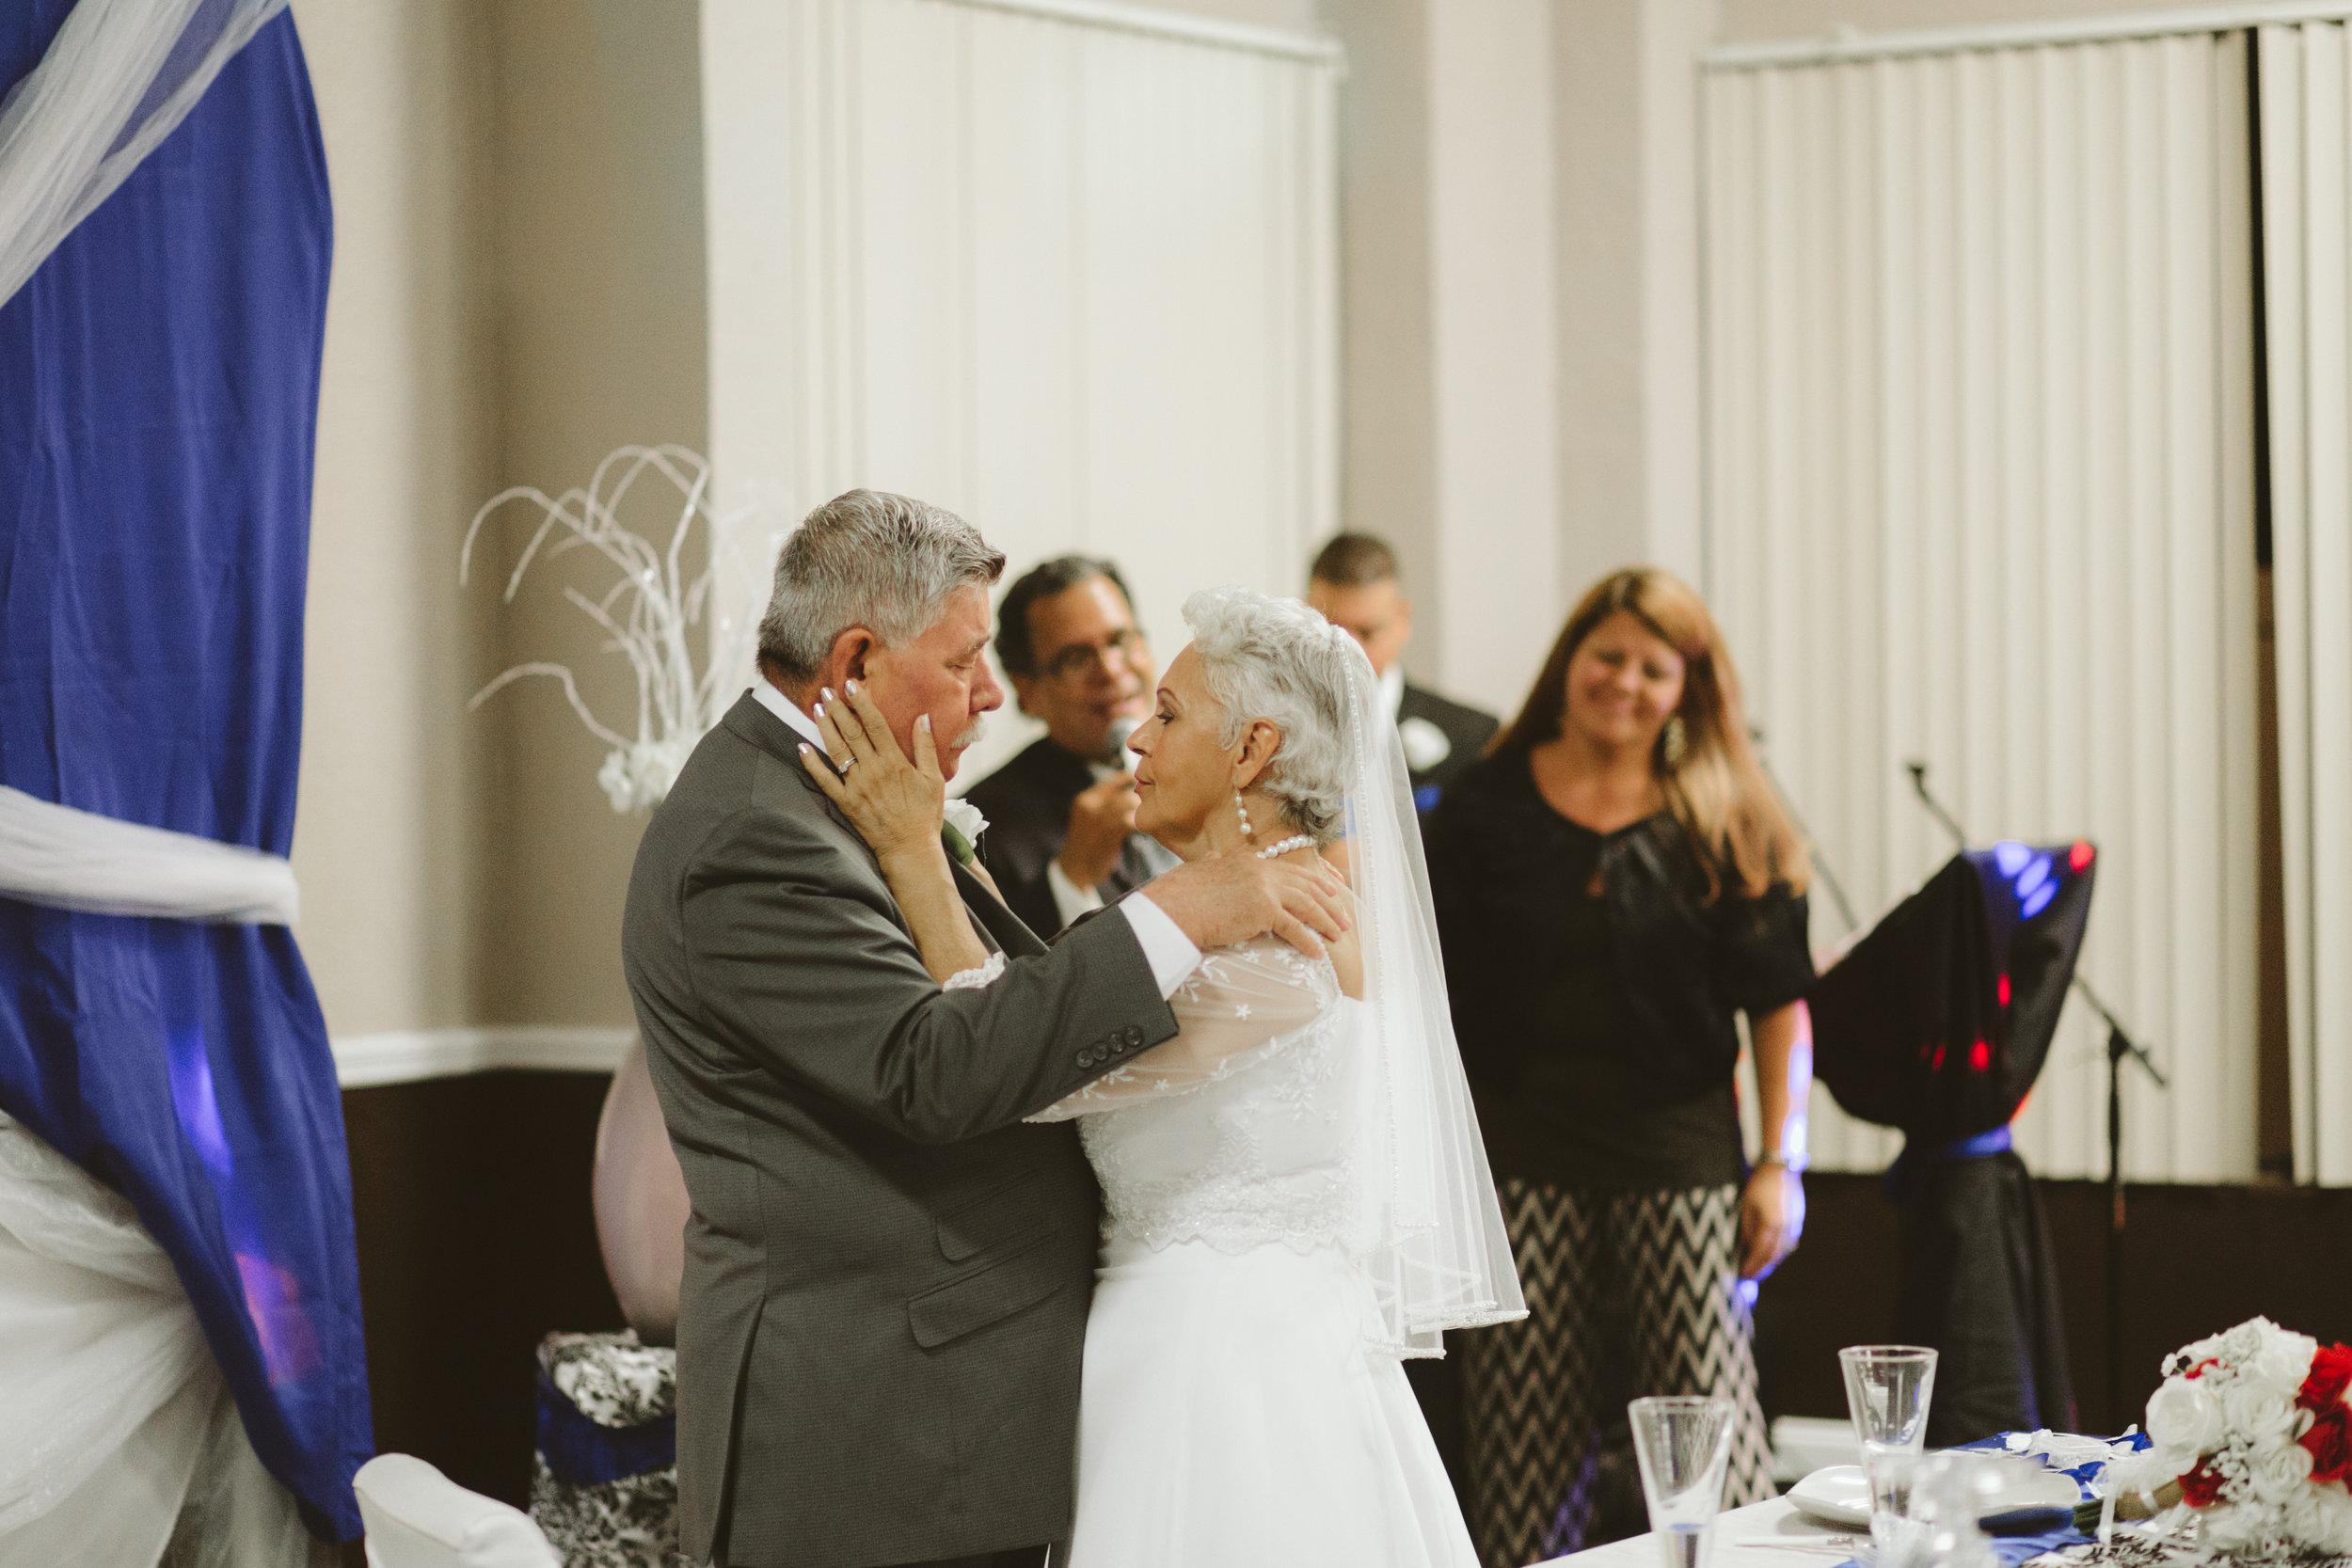 wedding | Vanessa Boy Photography | vanessaboy.com |-316.jpg